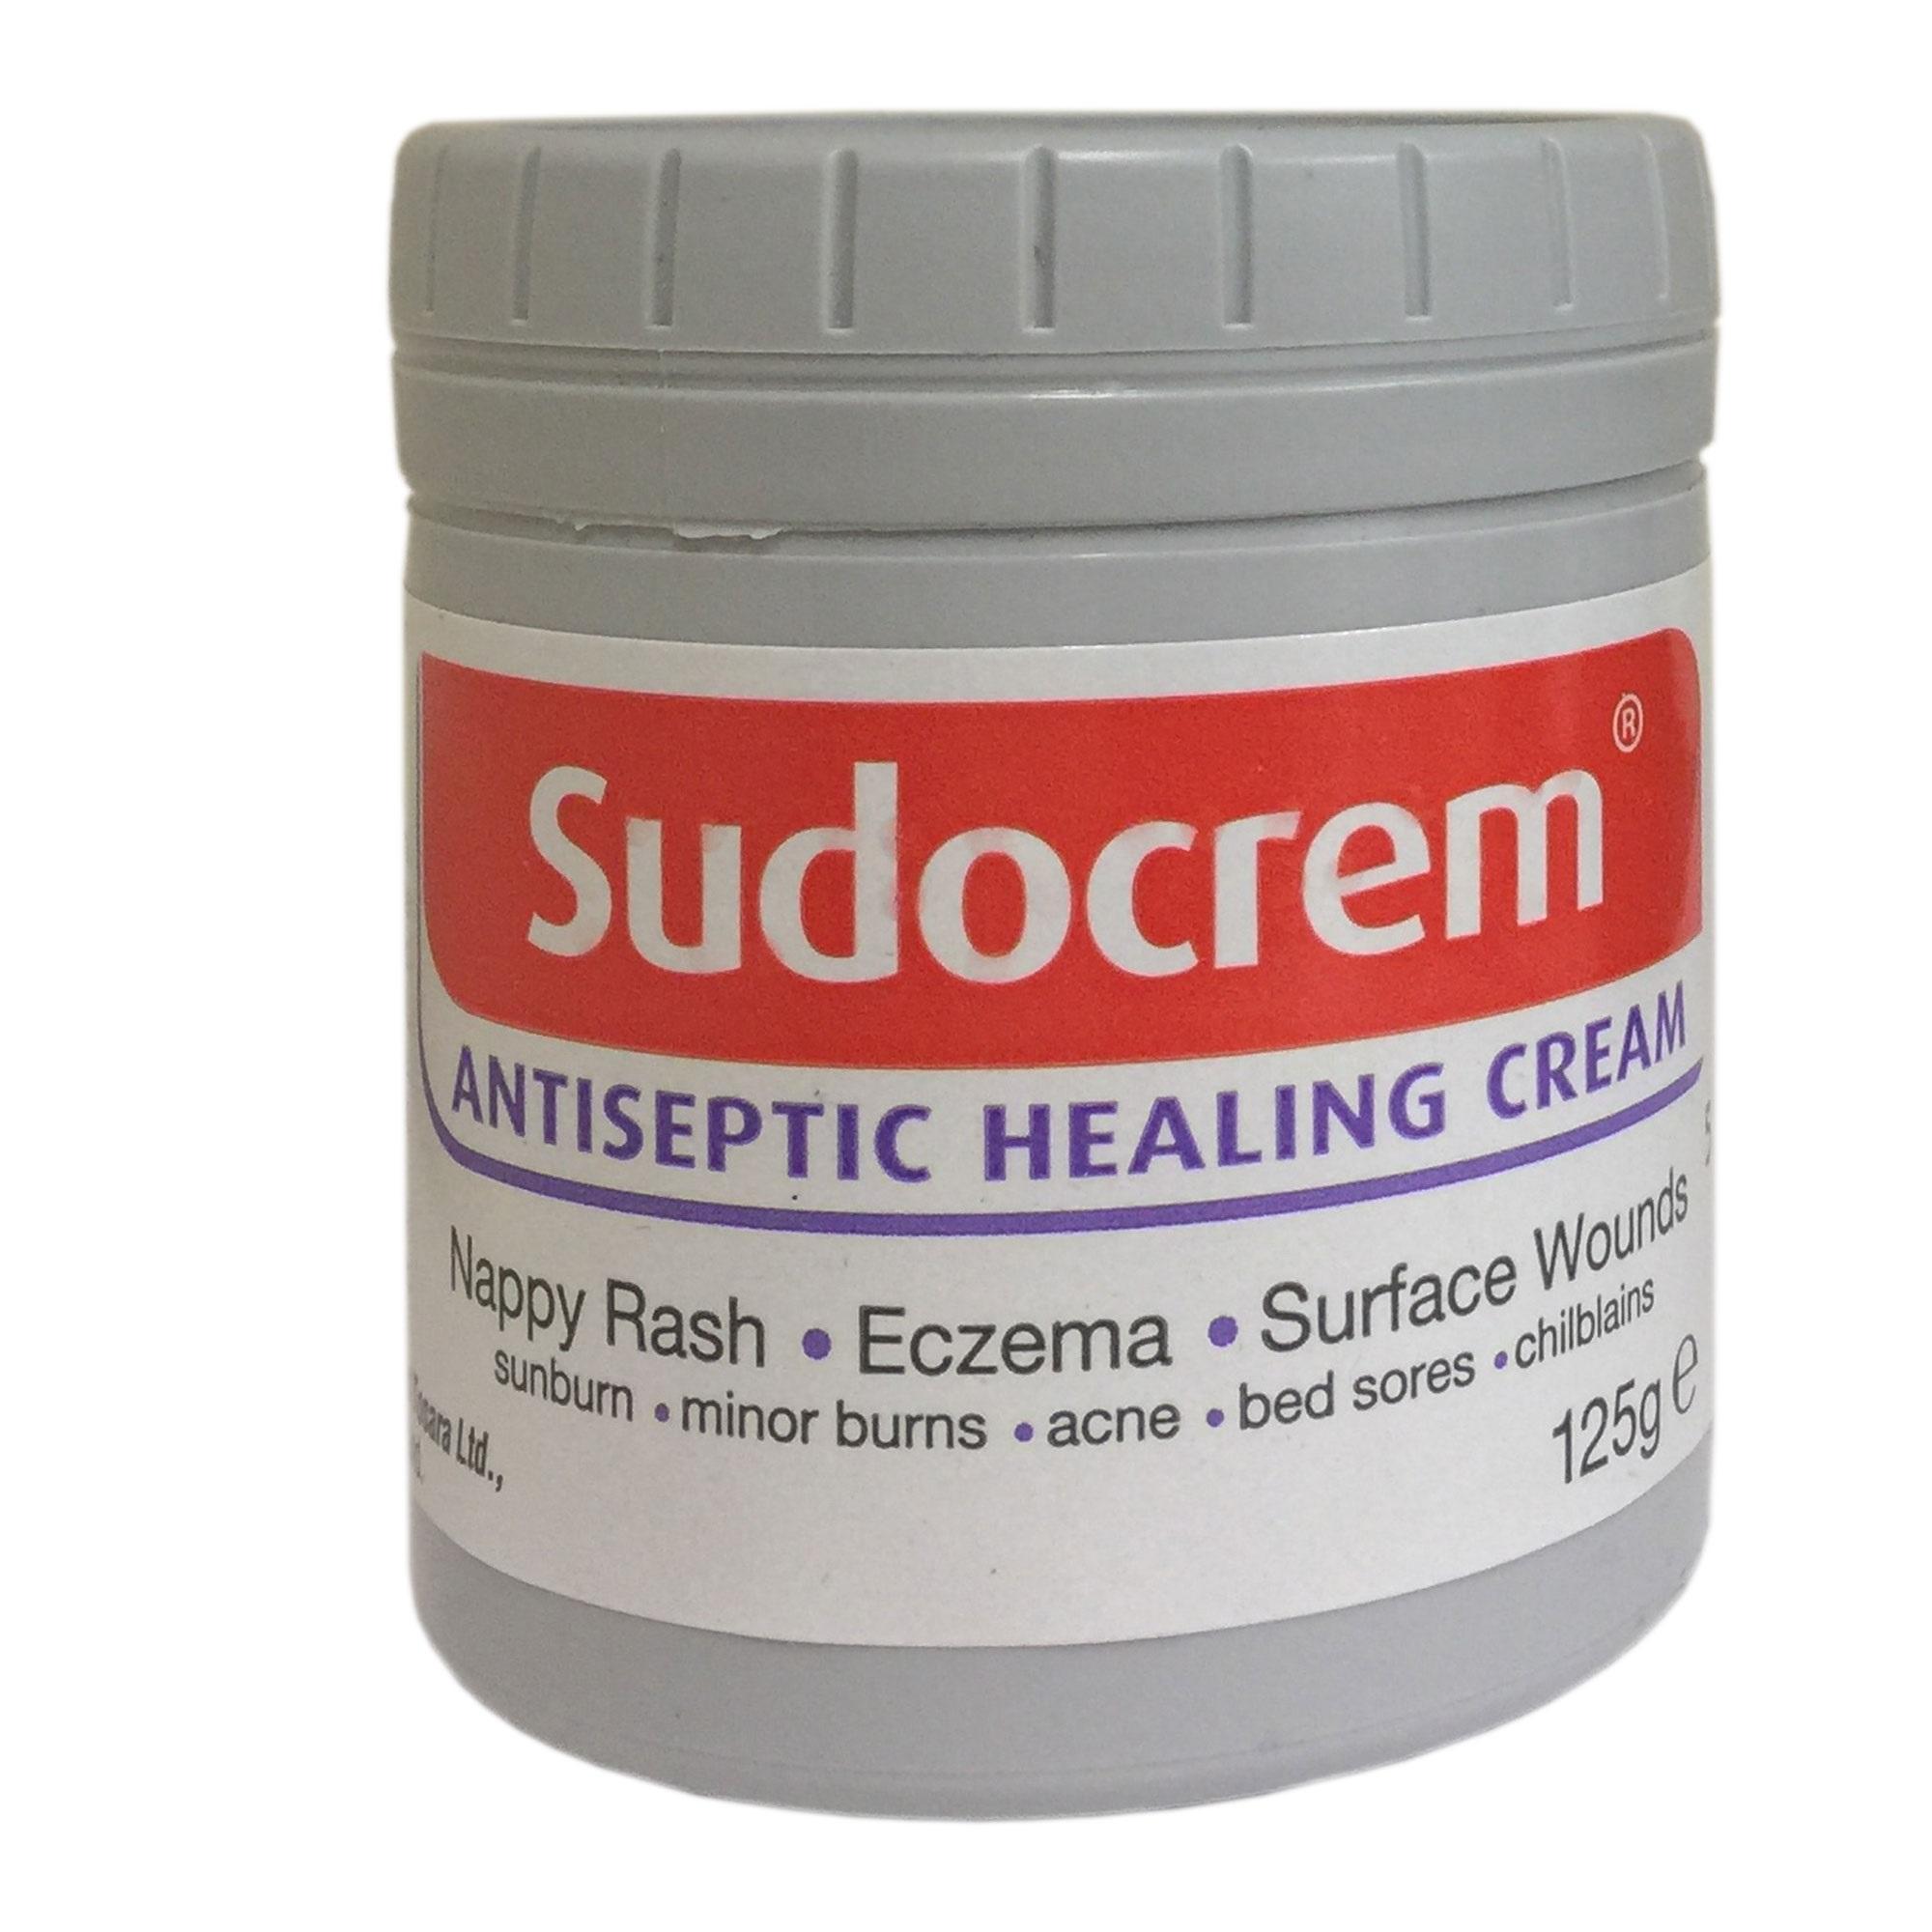 Sudocrem Antiseptic Healing Cream Nappy Rash Eczema Acne Relief 125g